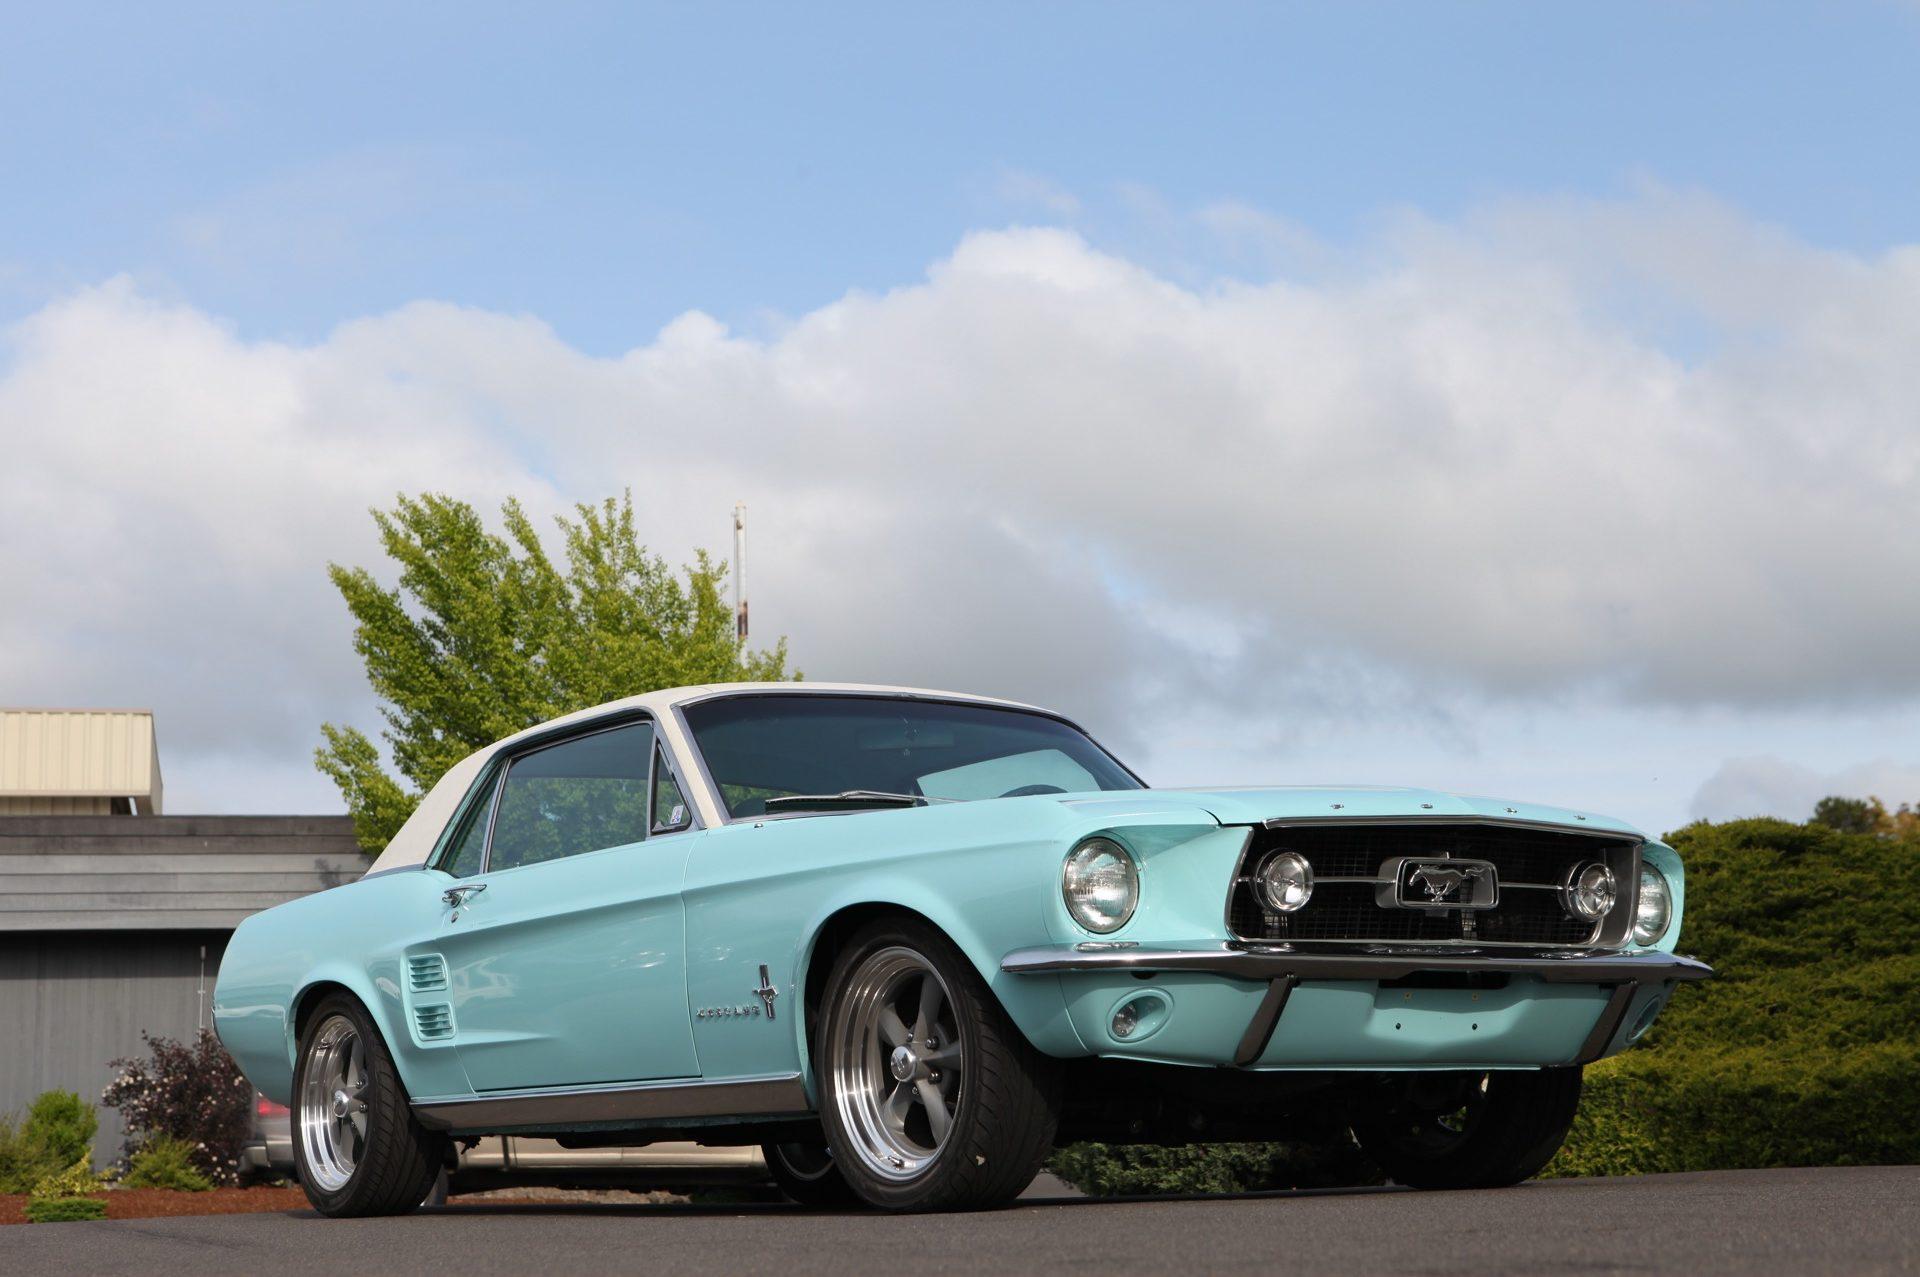 1967 Mustang - MetalWorks Classics Auto Restoration & Speed Shop